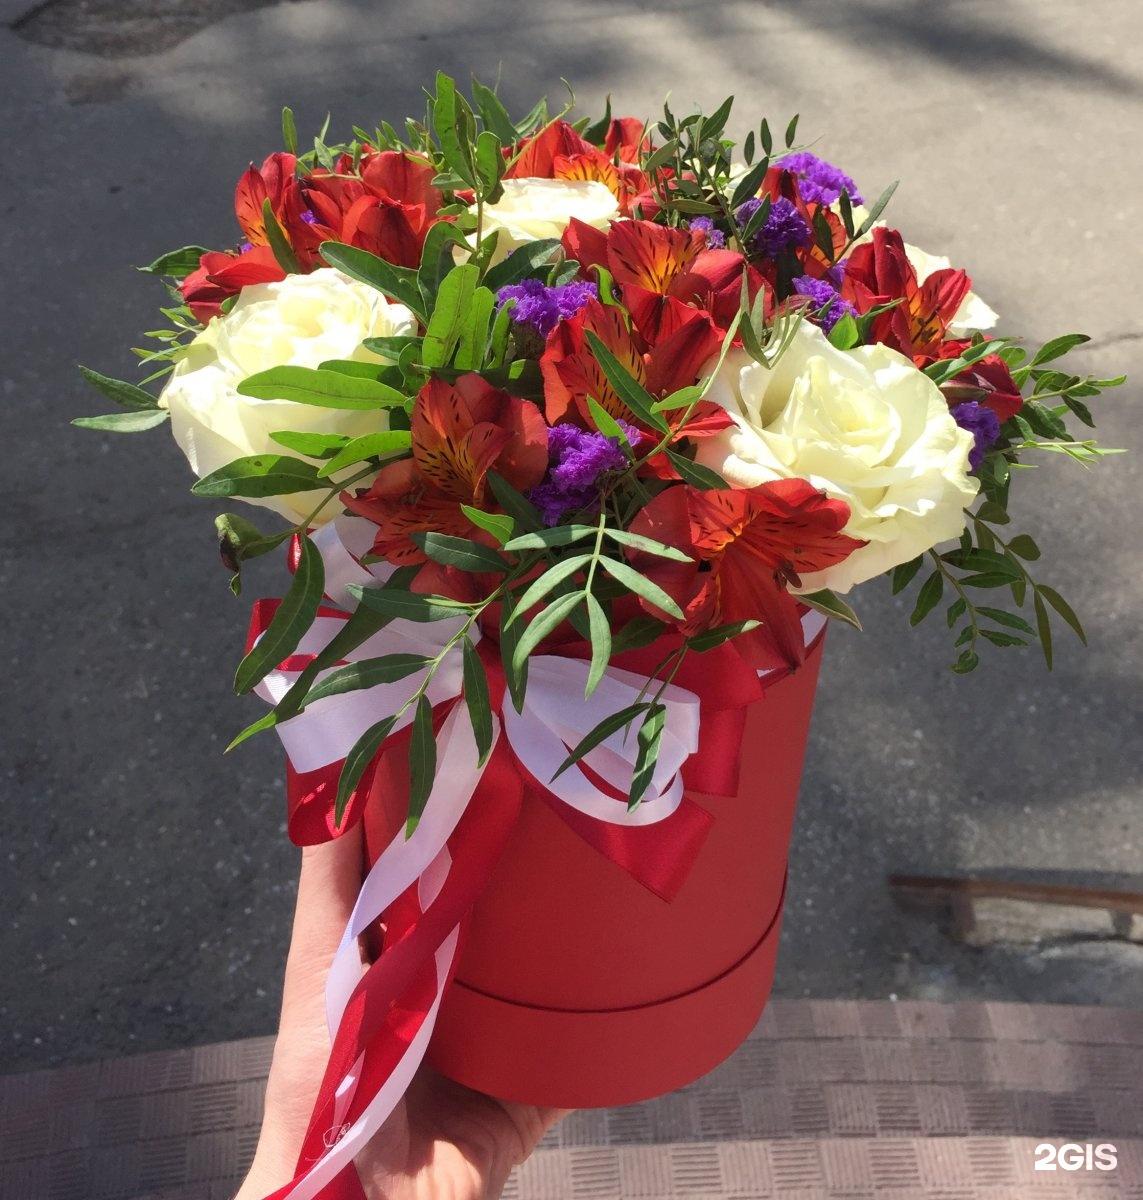 Служба доставки цветов и подарков в калининграде